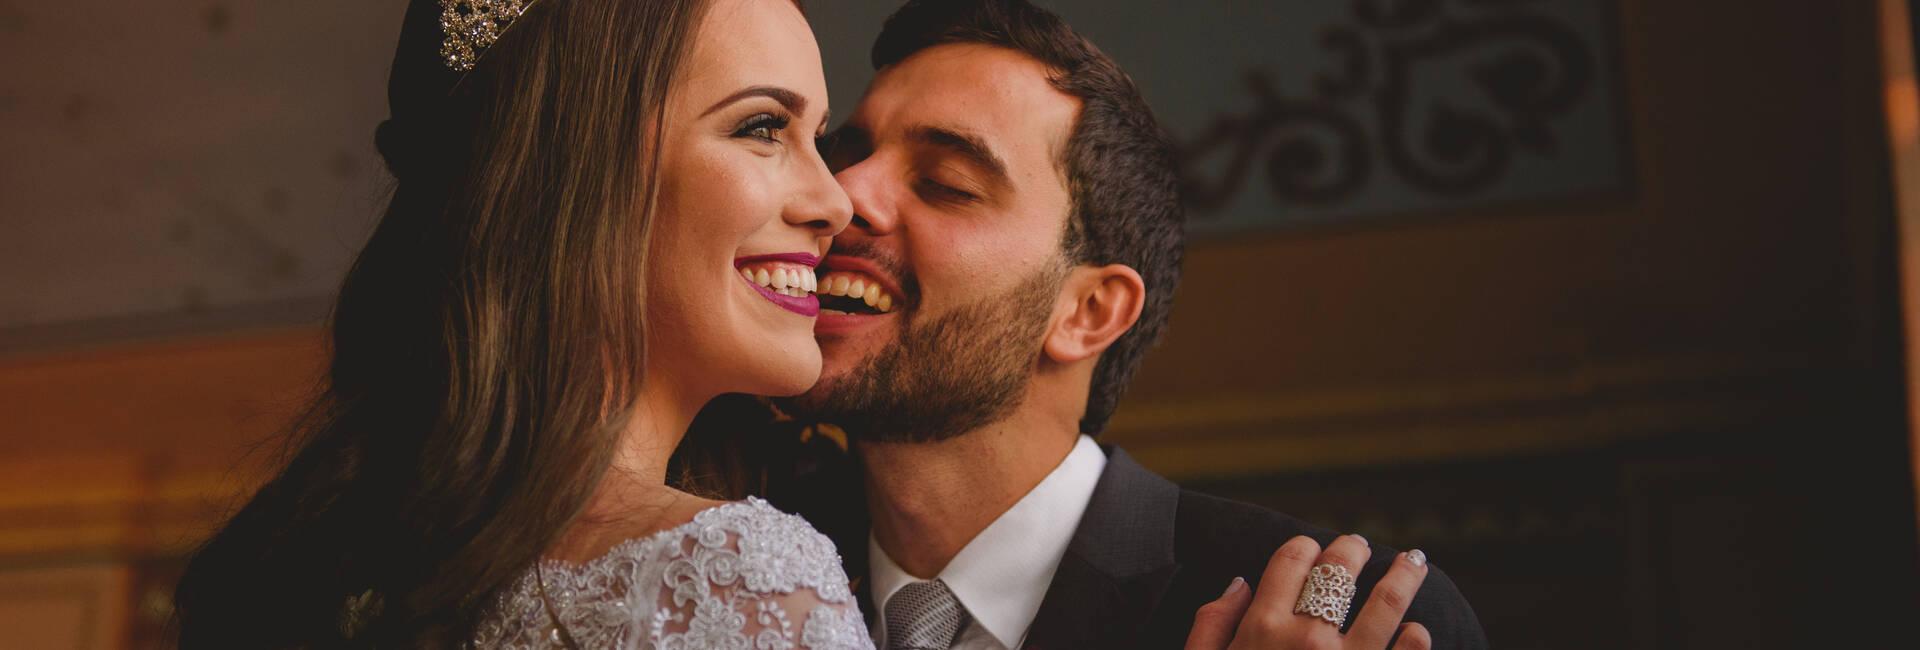 Annelisa&Vitor de Casamento